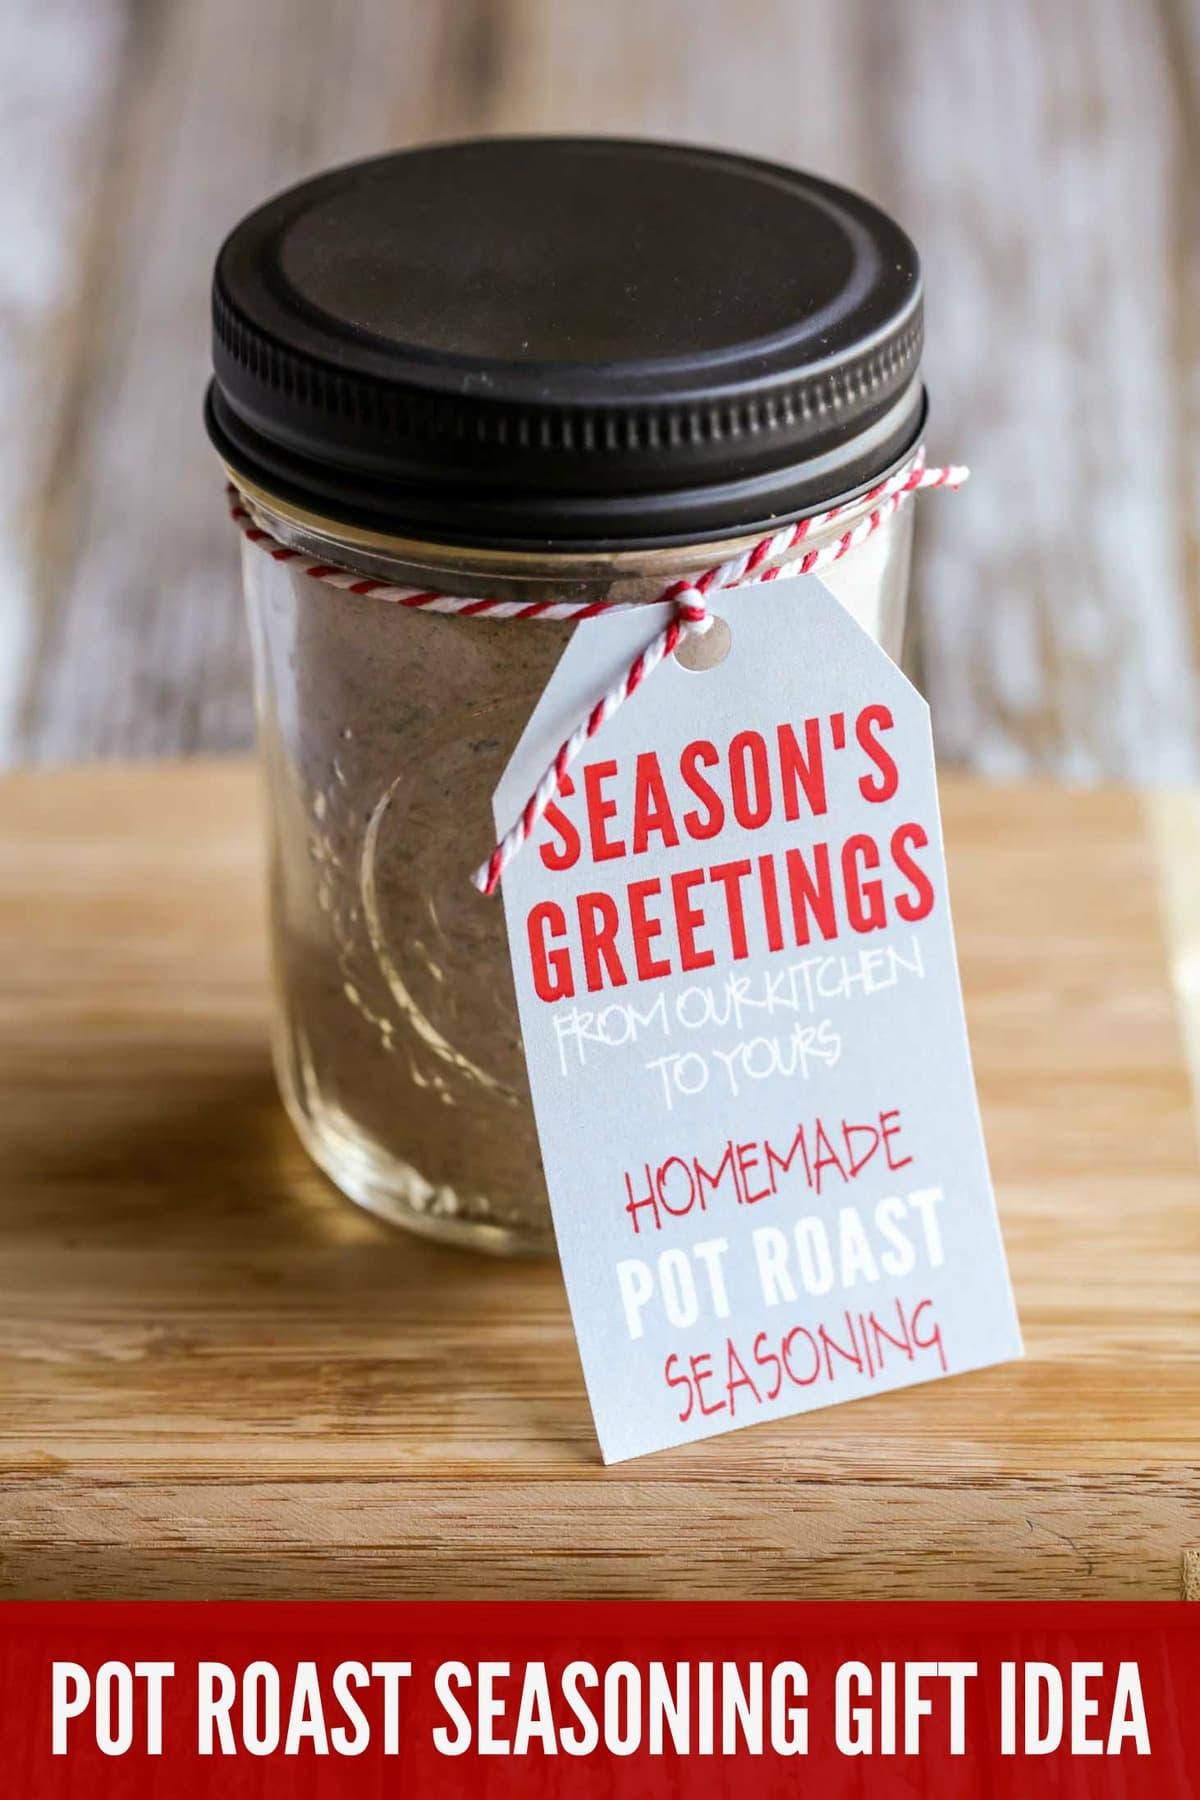 Homemade Pot Roast Seasoning Gift Idea